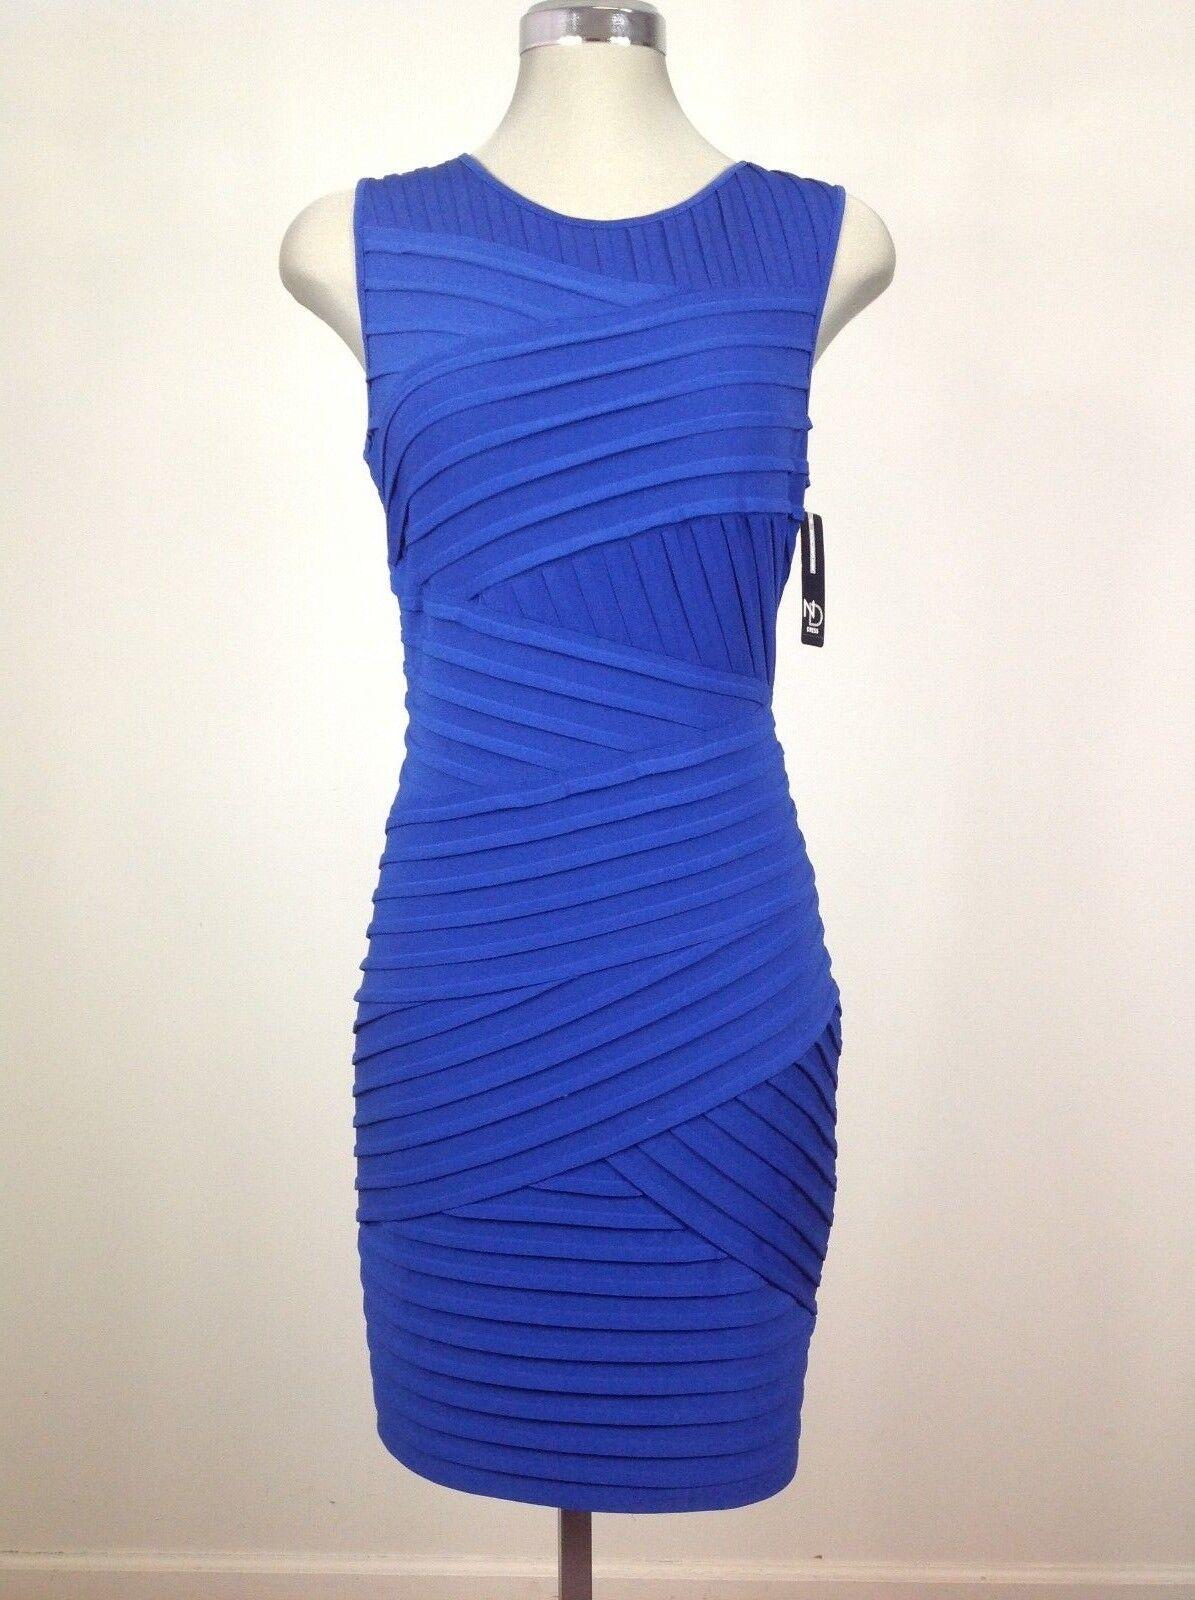 New Direction NEW Atlantis bluee Sleeveless Sexy Bodycon Pleated Ribbed Dress